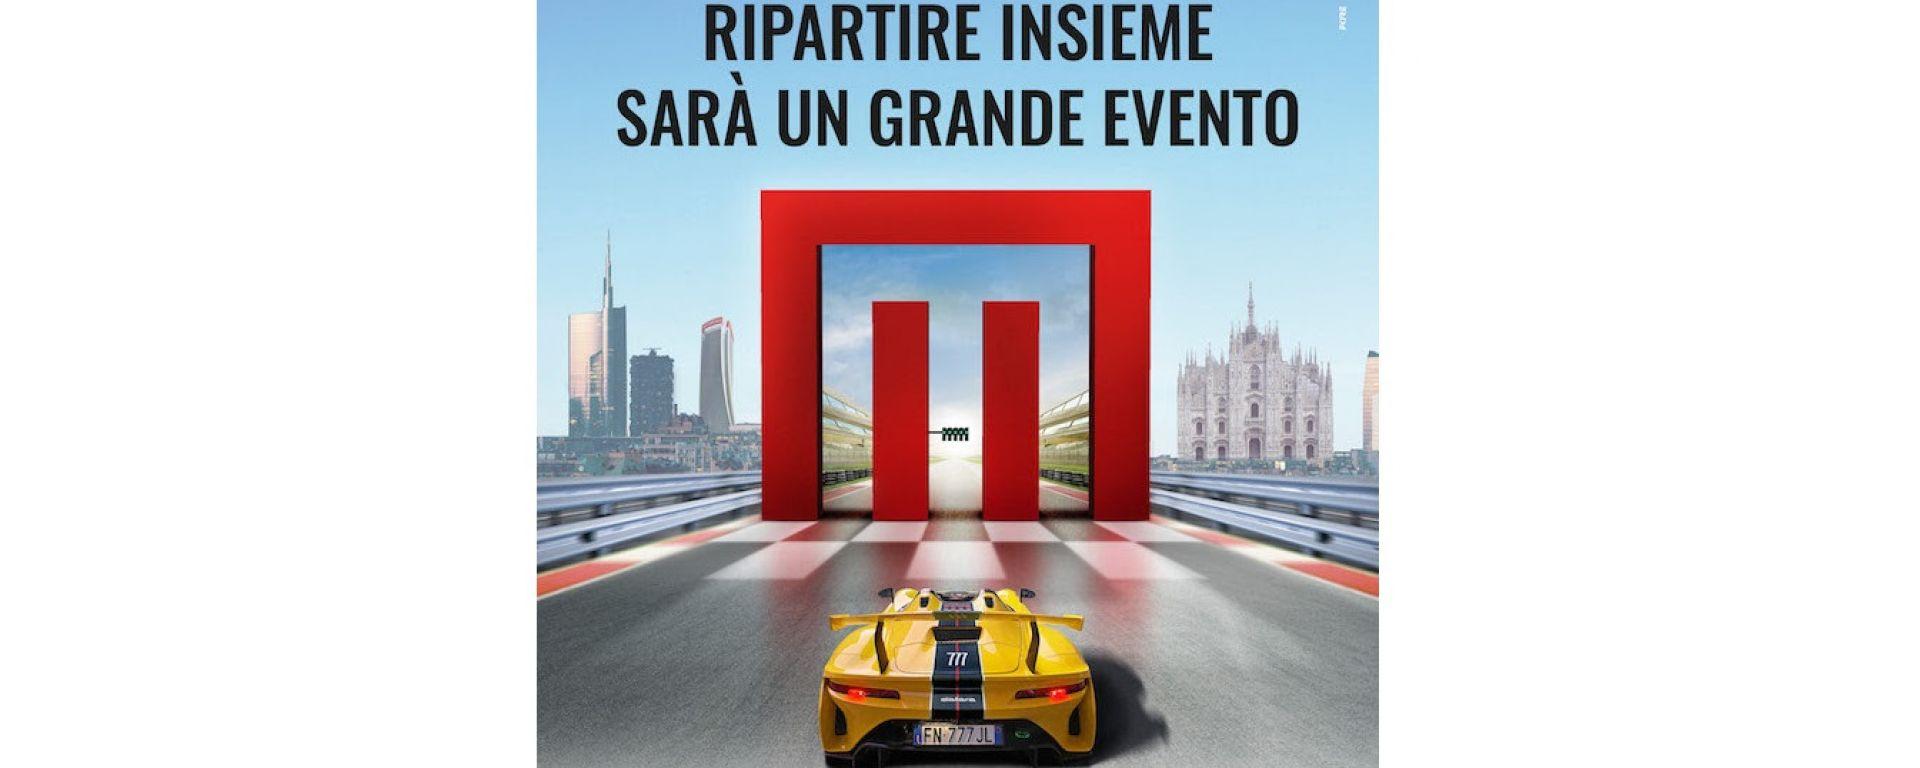 Milano Monza Open Air Motor Show: festa rinviata ad ottobre